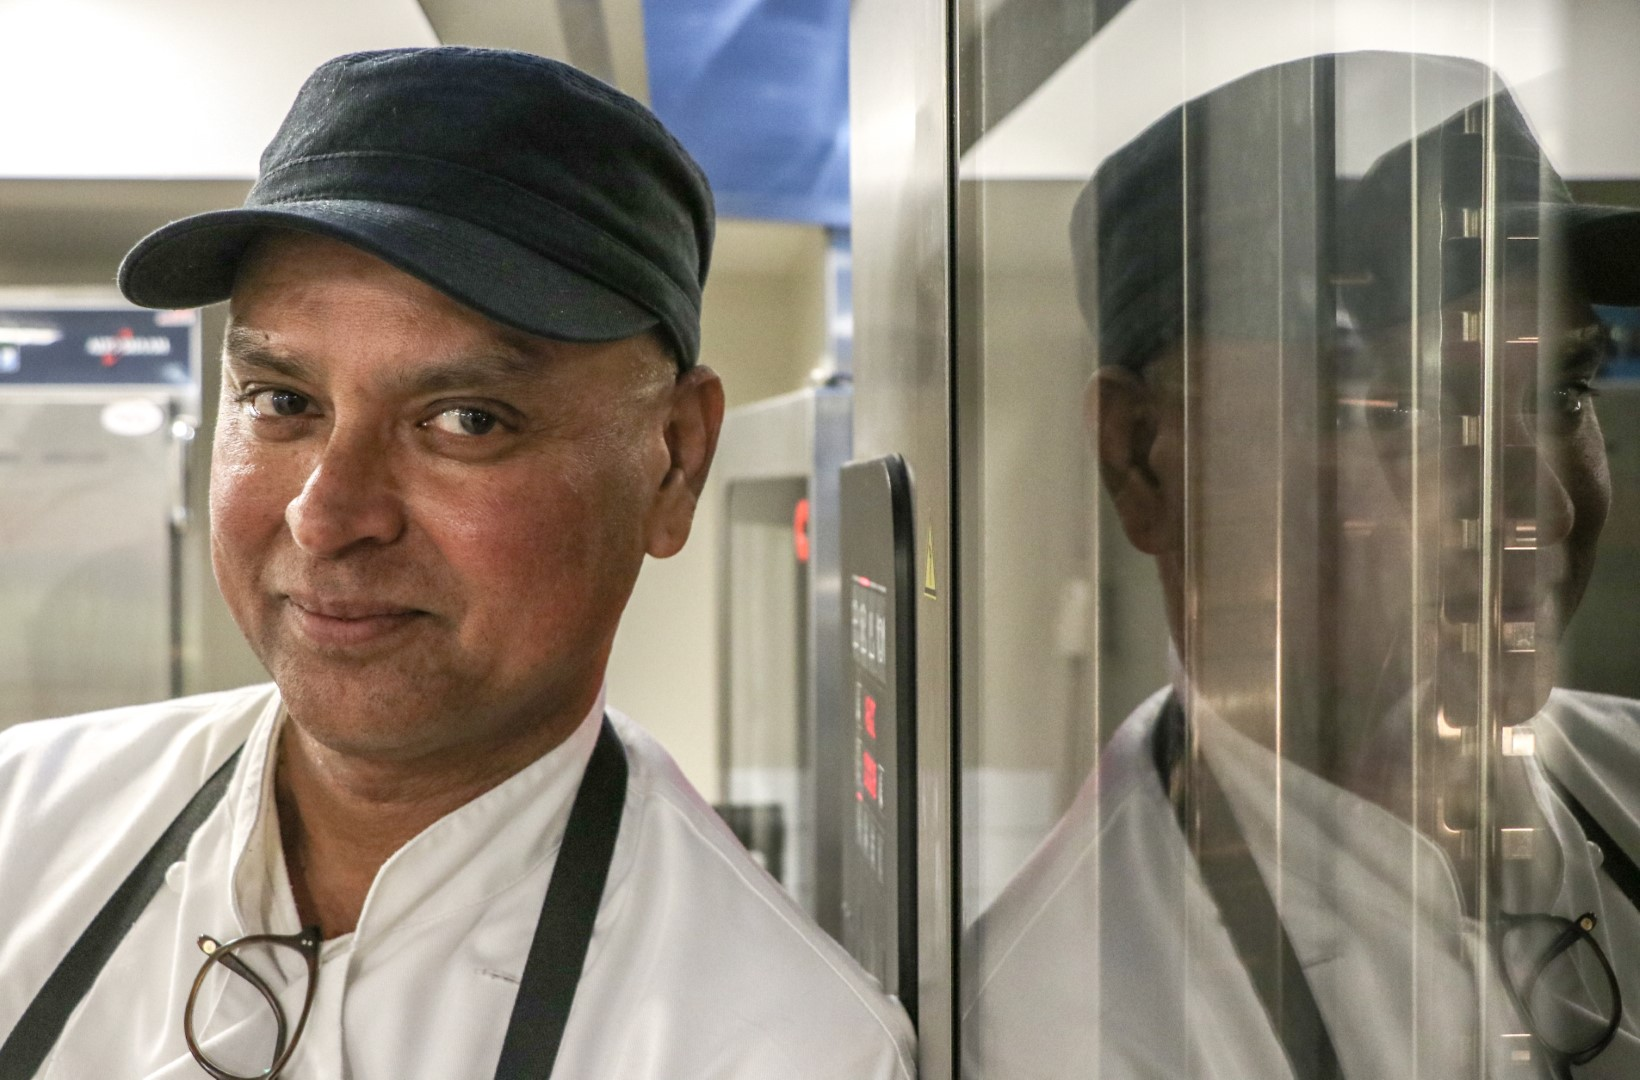 Taking Nellie Melba's kitchen to 'the next level'